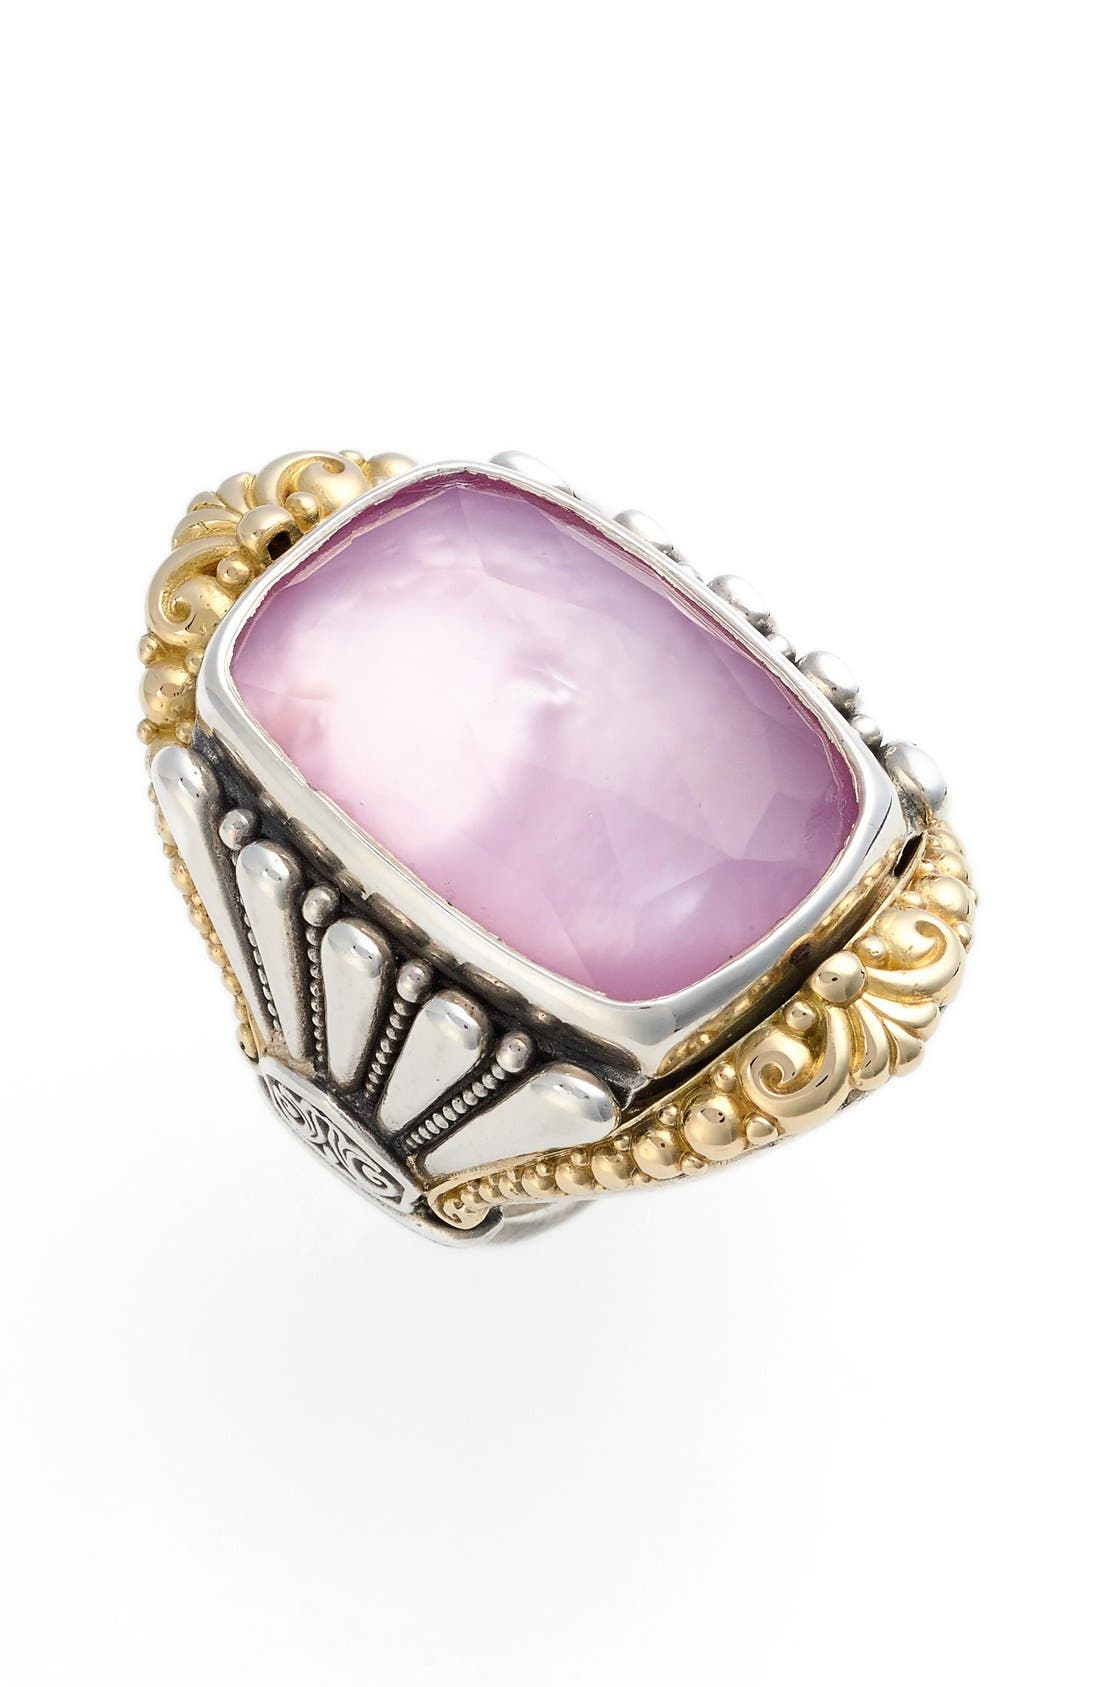 Main Image - Konstantino 'Iliada' Large Doublet Ring